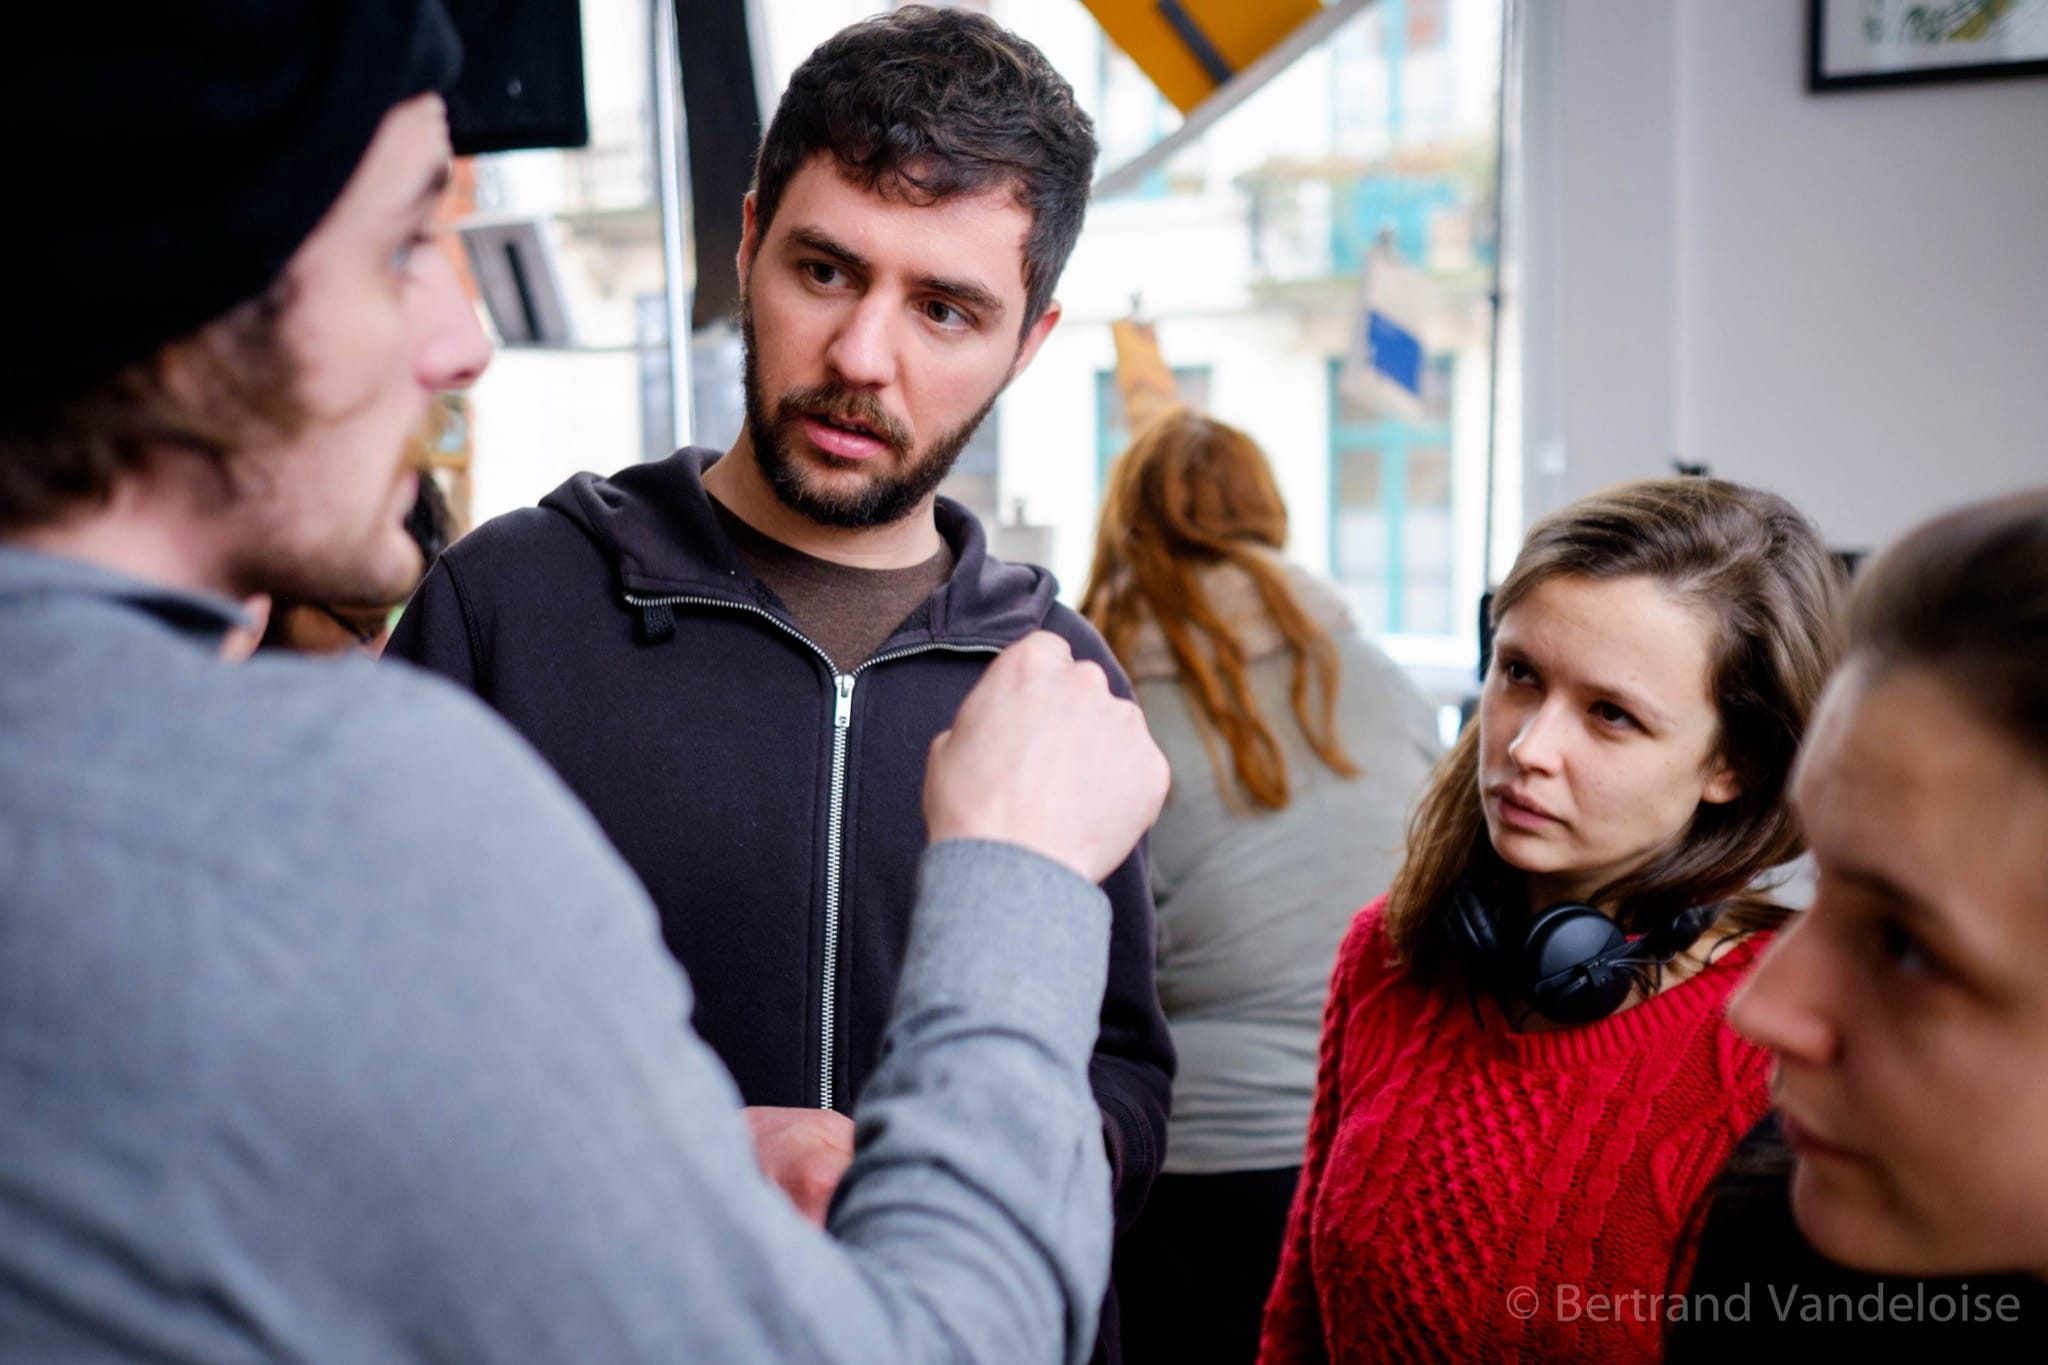 LA THÉORIE DU Y Caroline Taillet, Martin Landmeters (c) Bertrand Vandeloise image 1